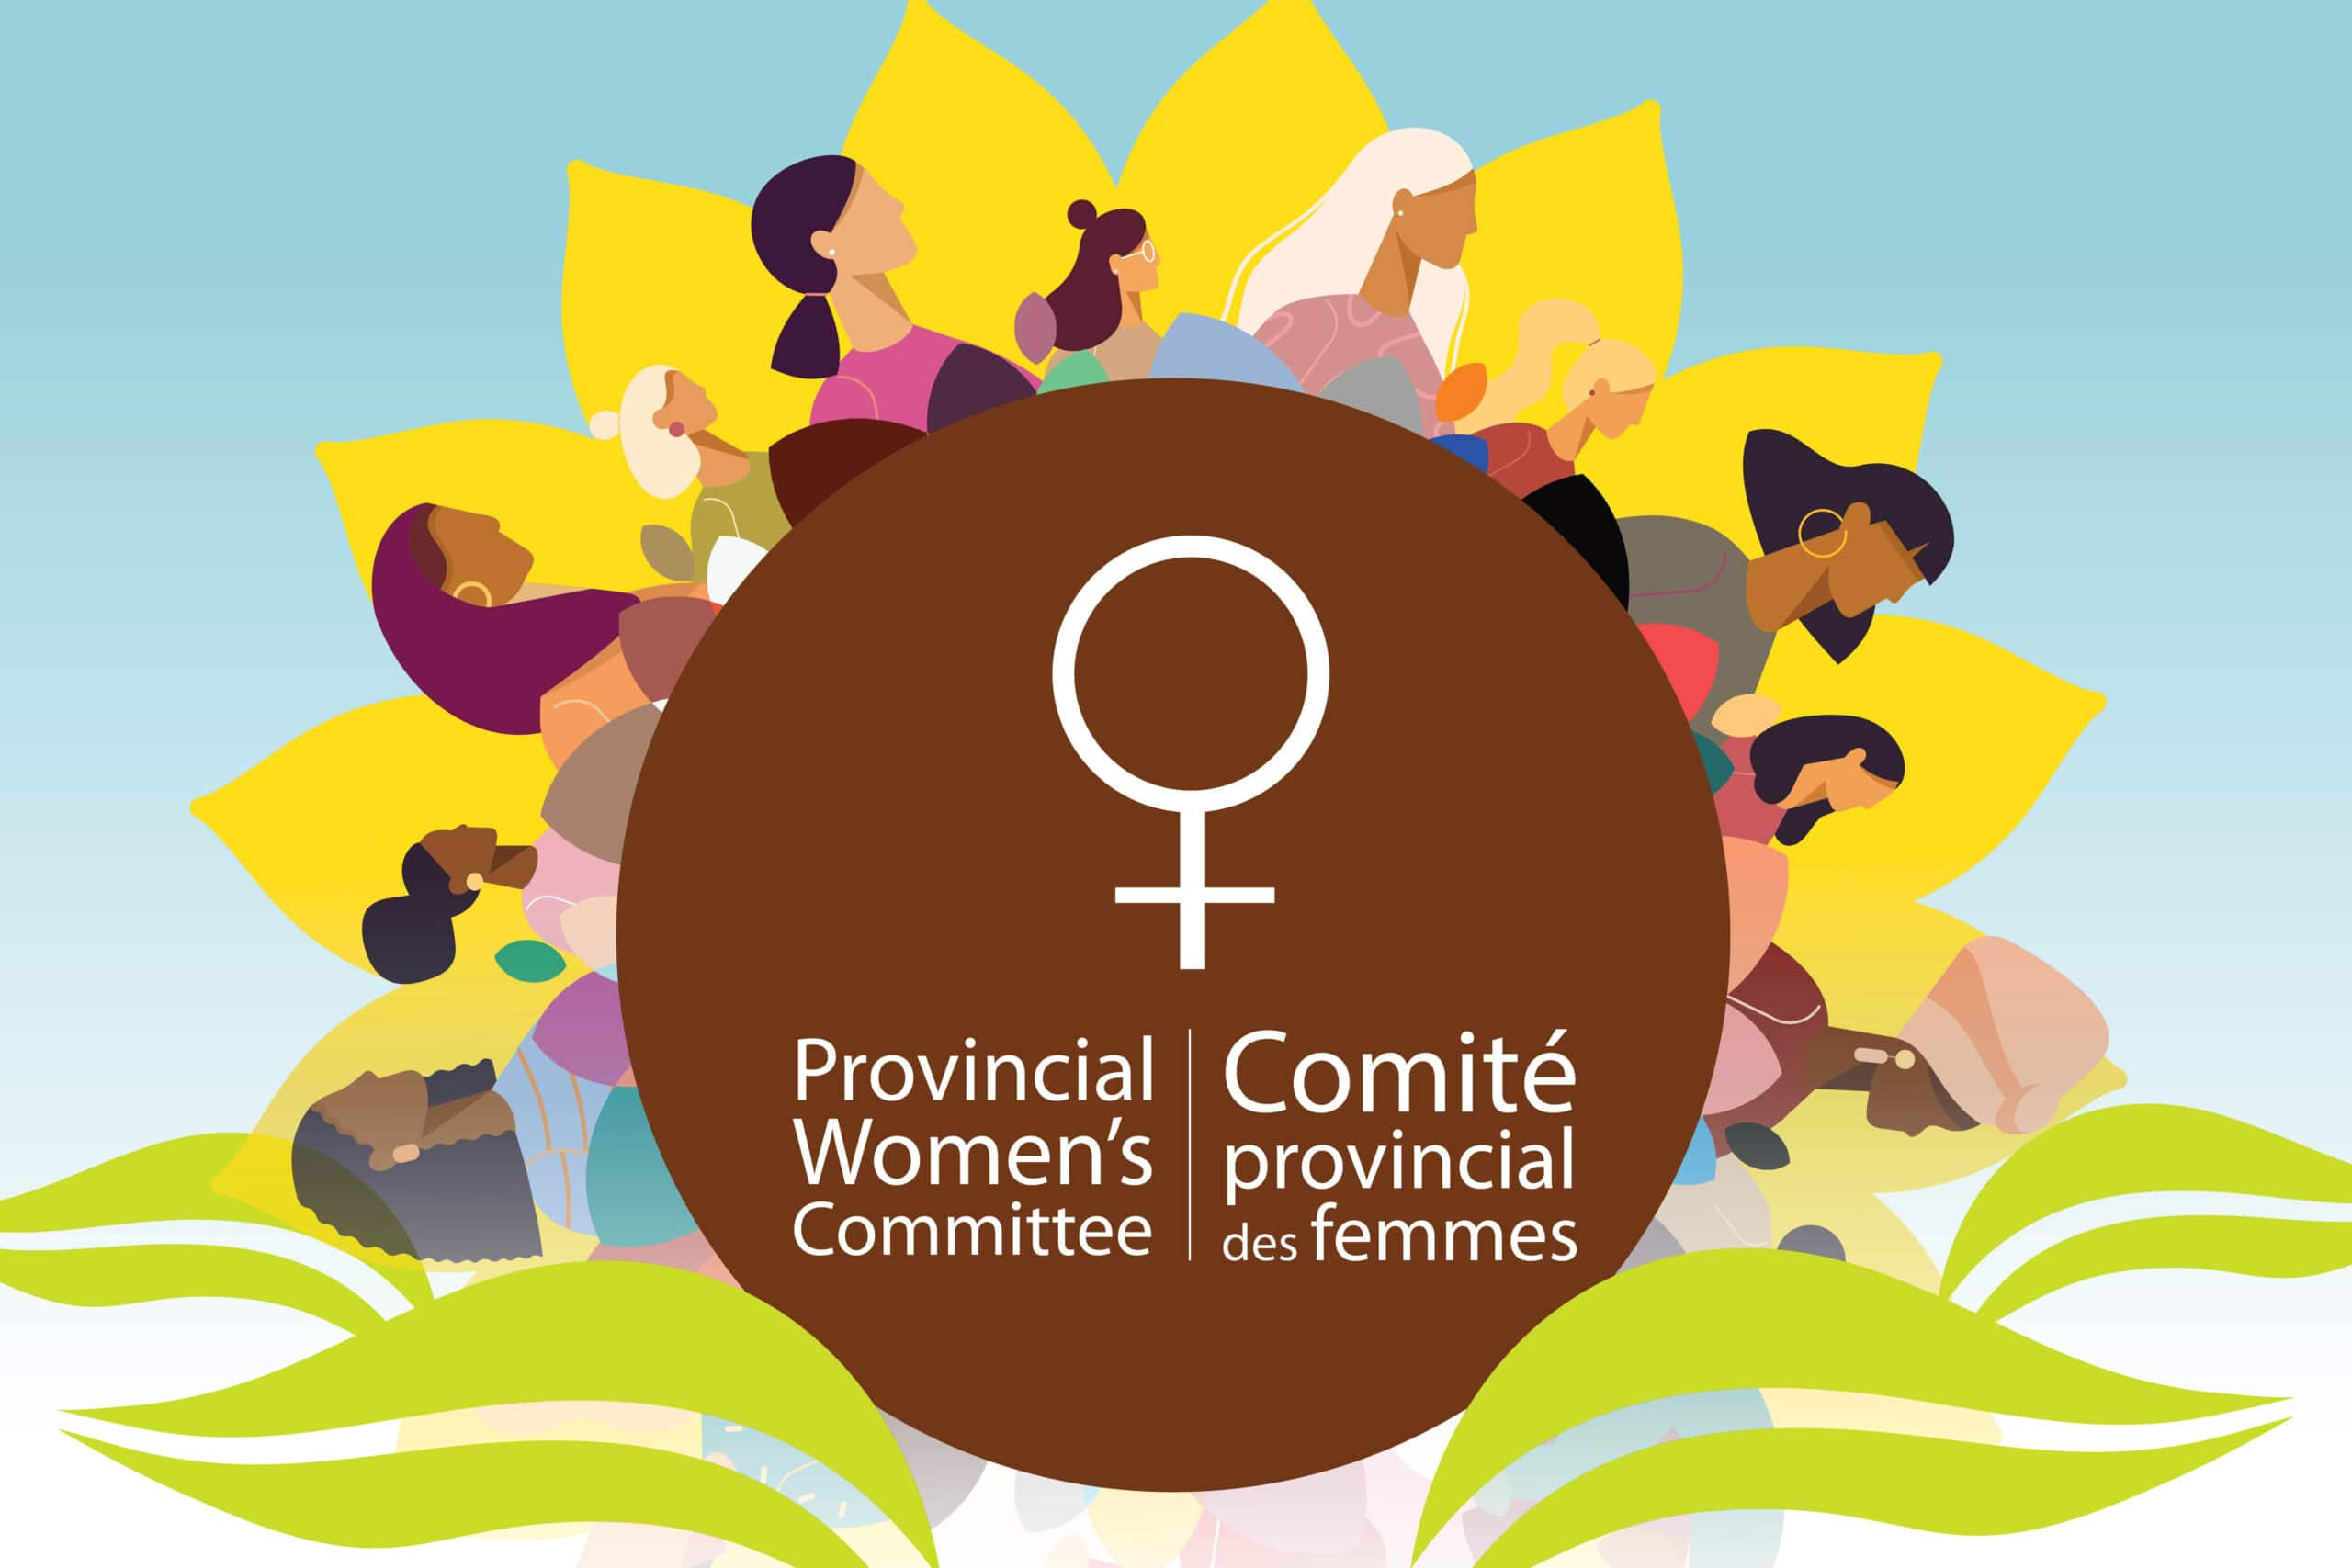 Provincial Women's Committee, Comite provincial des femmes